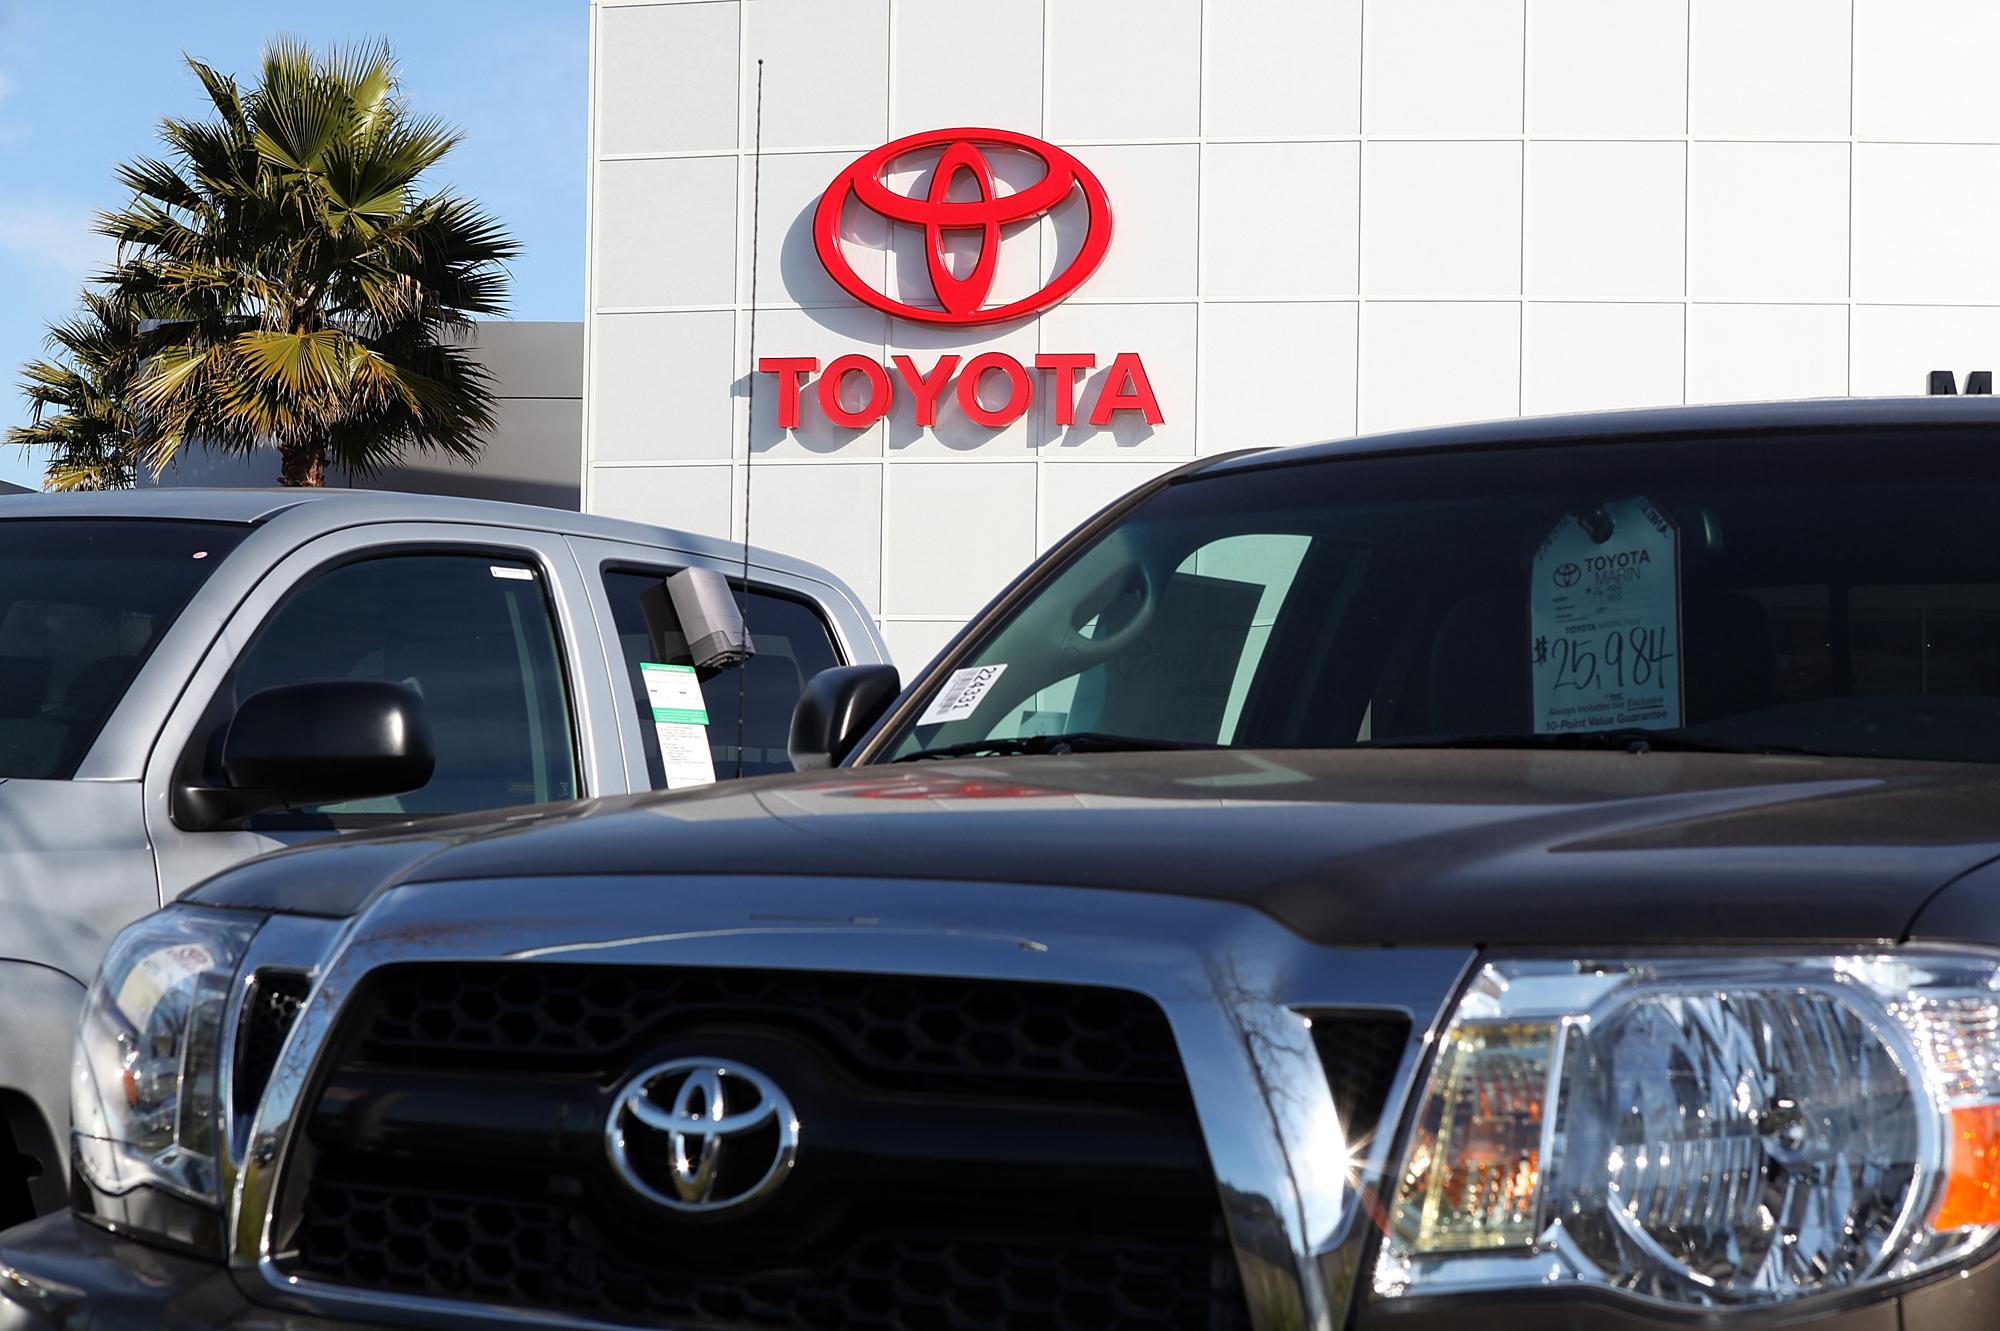 A Toyota sales lot.